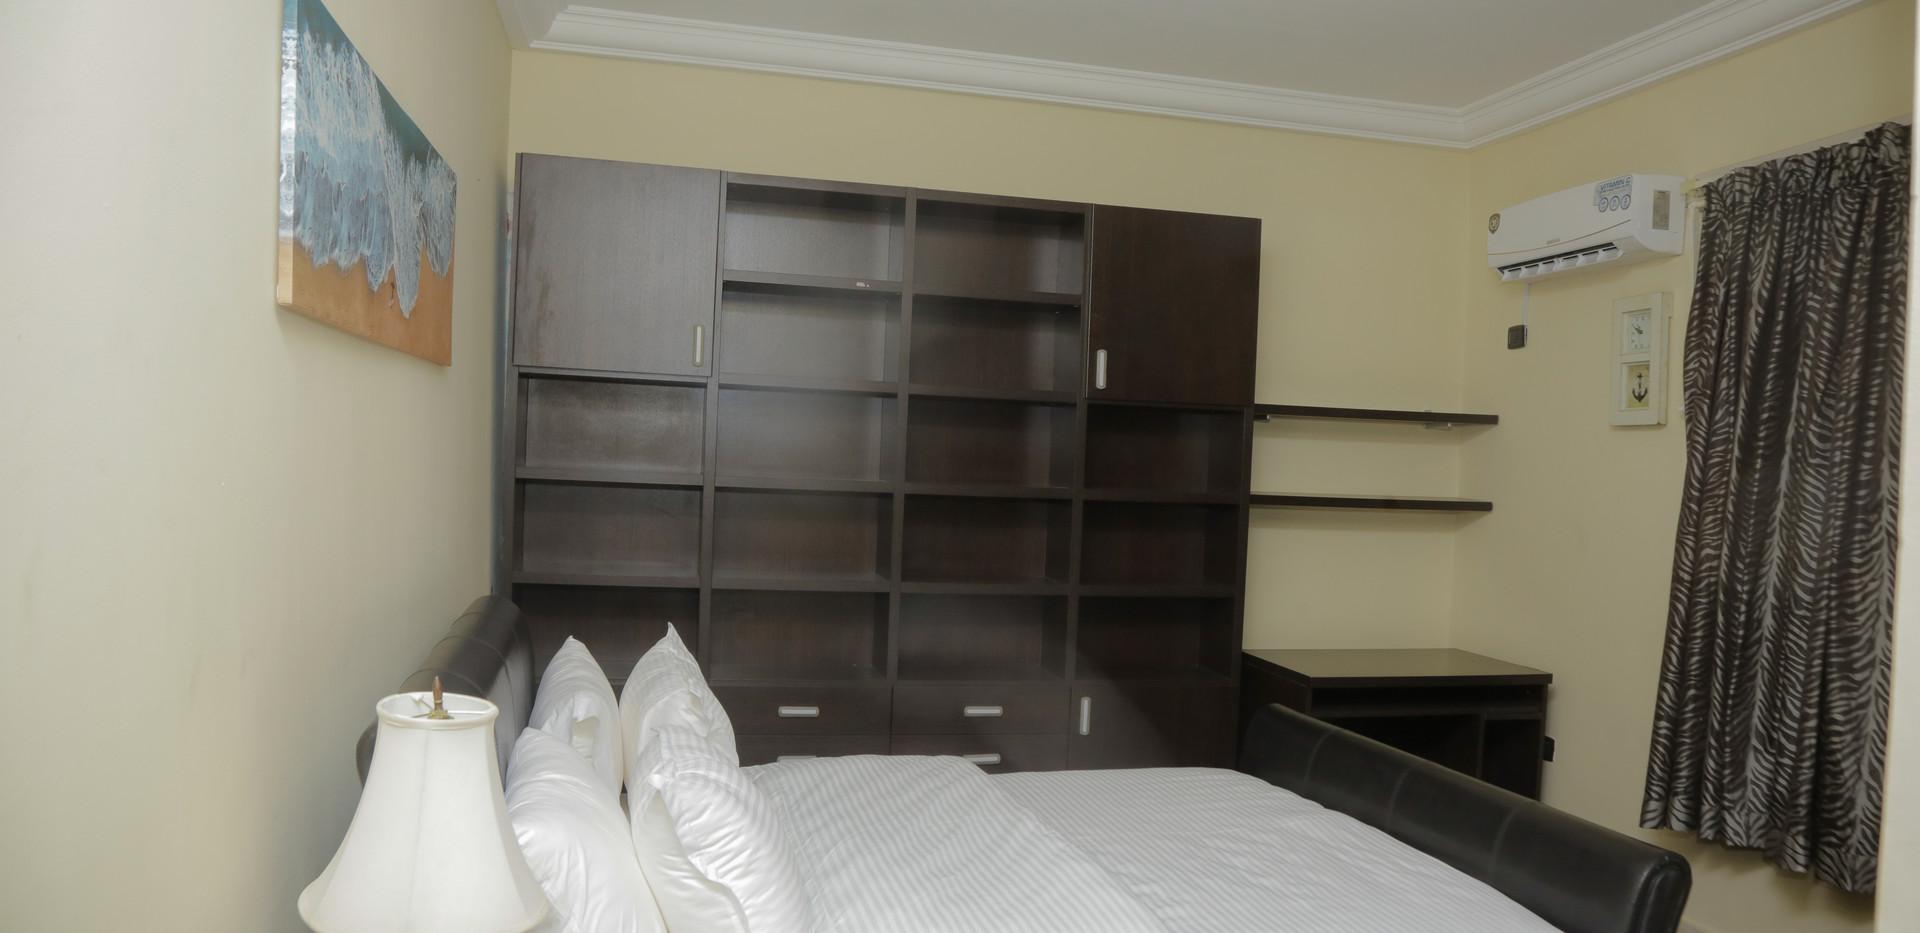 Apartments-15.JPG